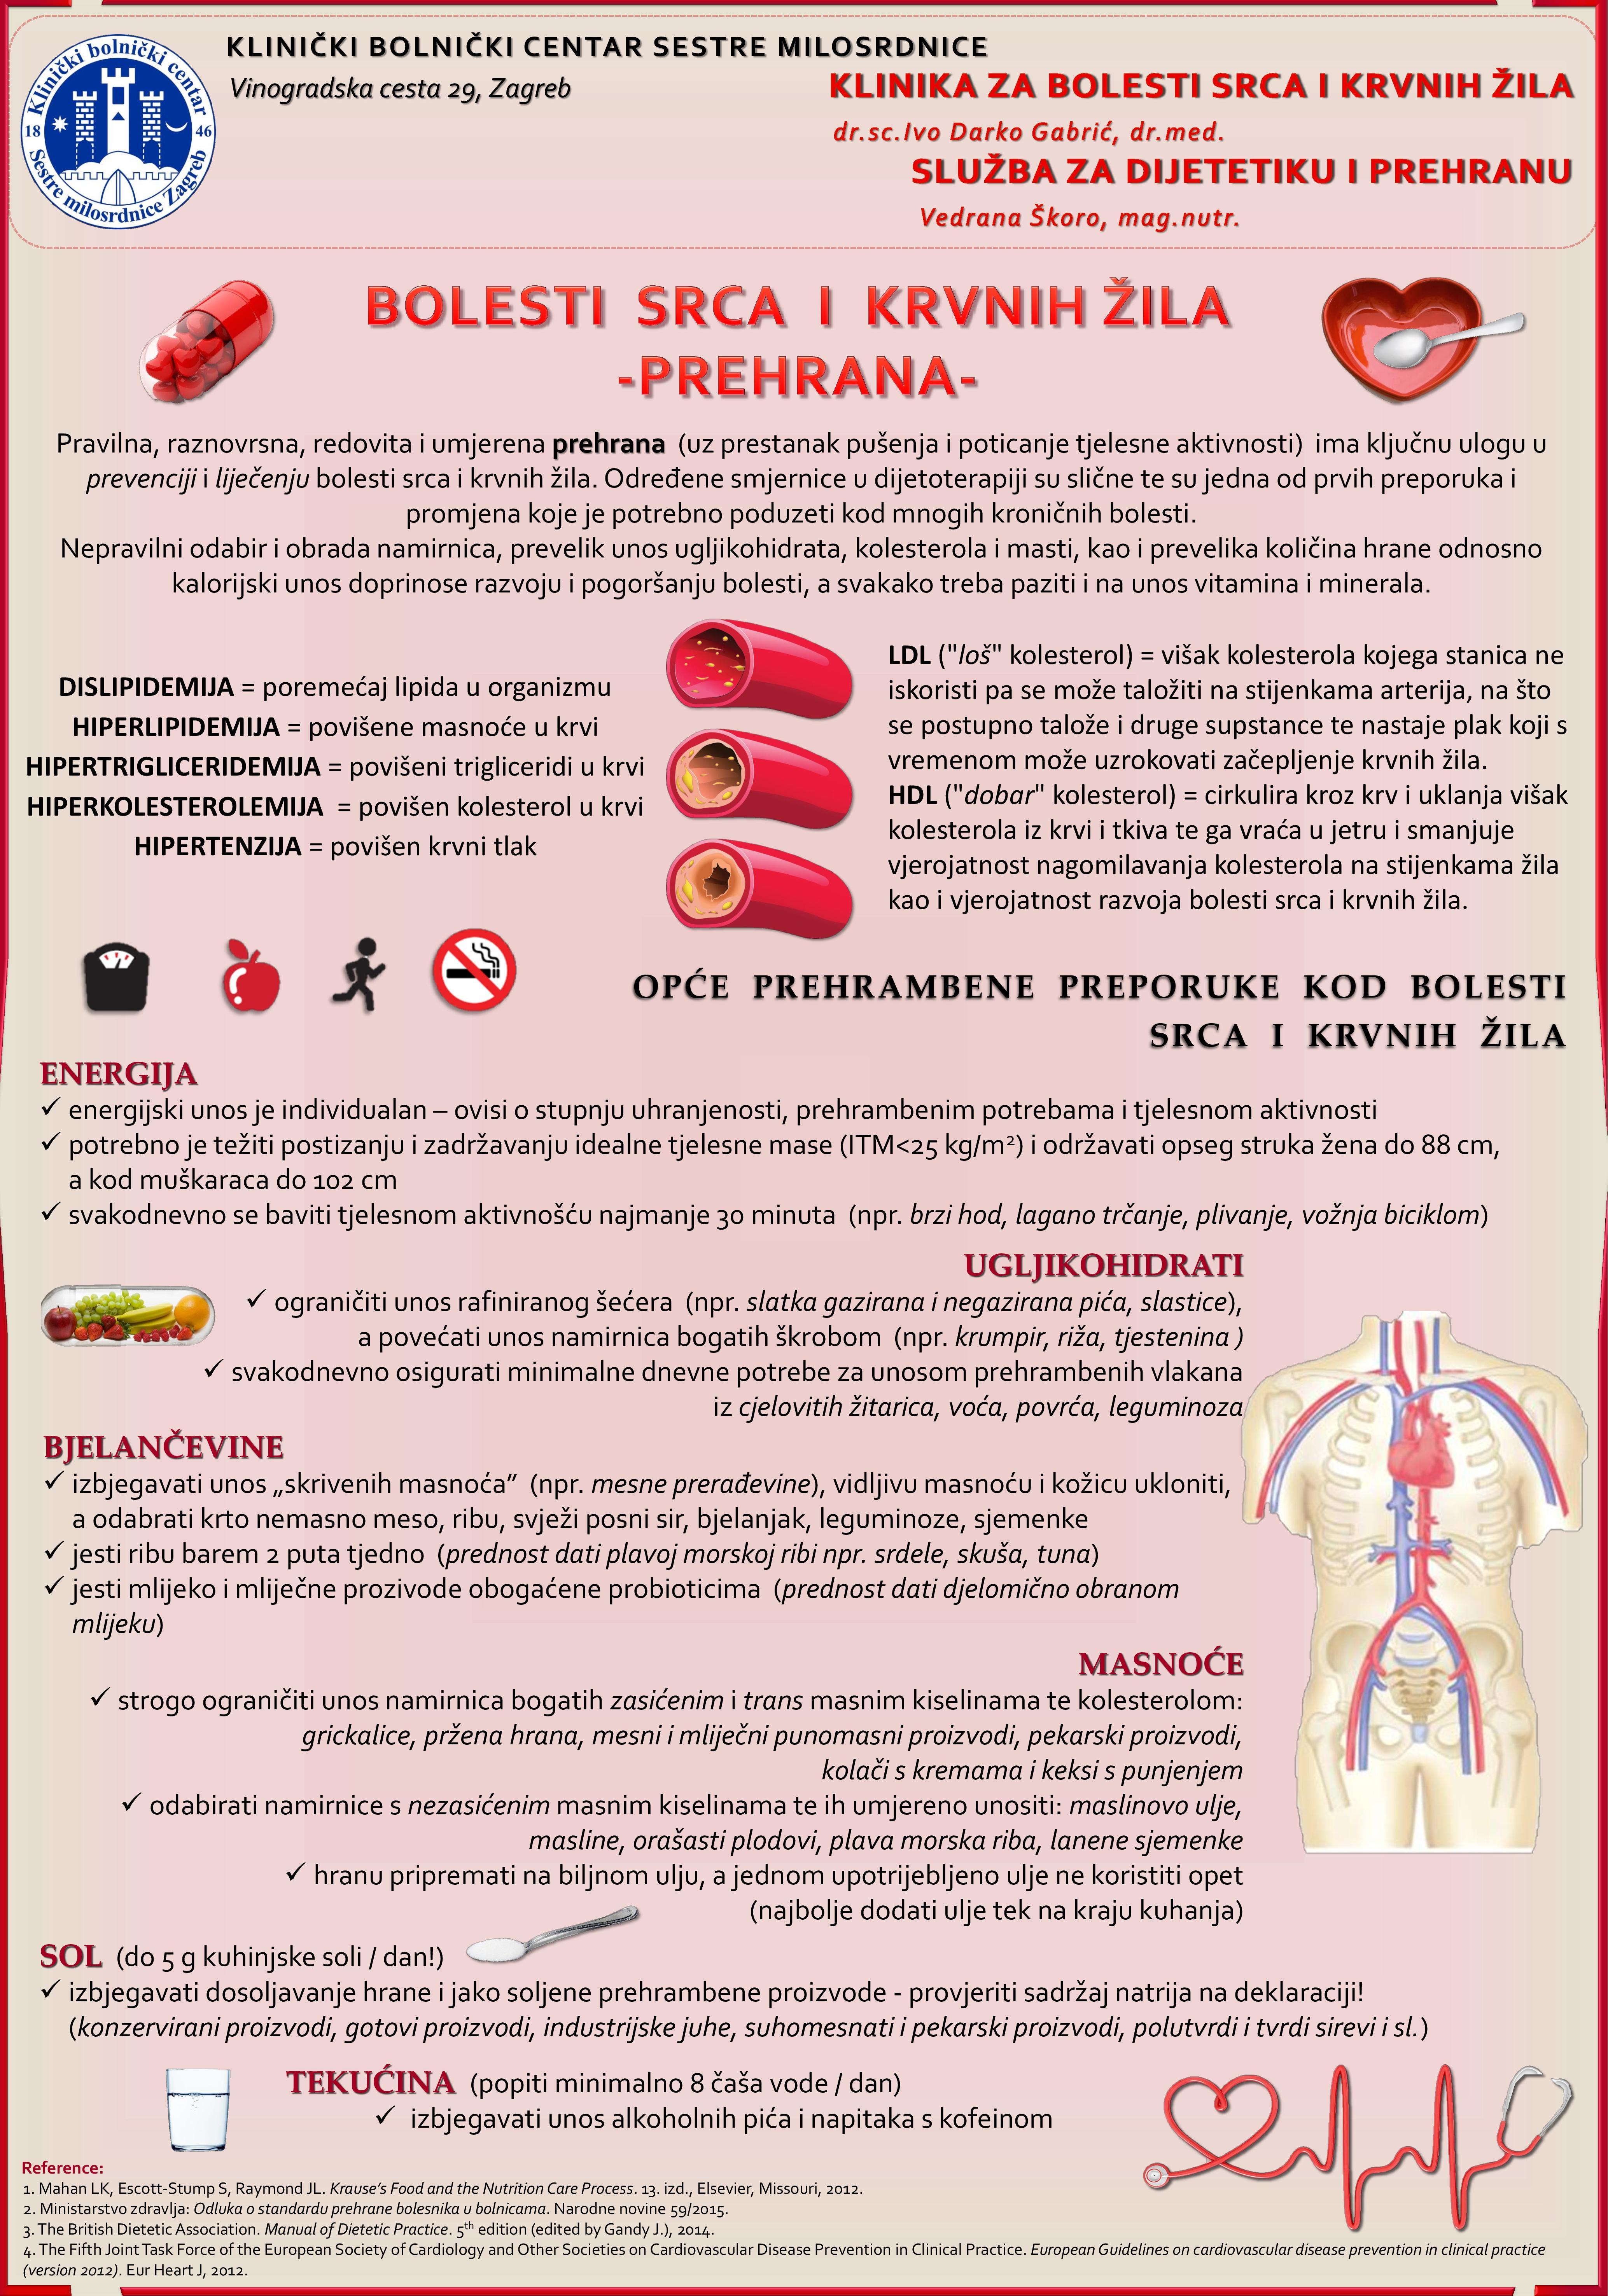 hipertenzija, kolesterol)